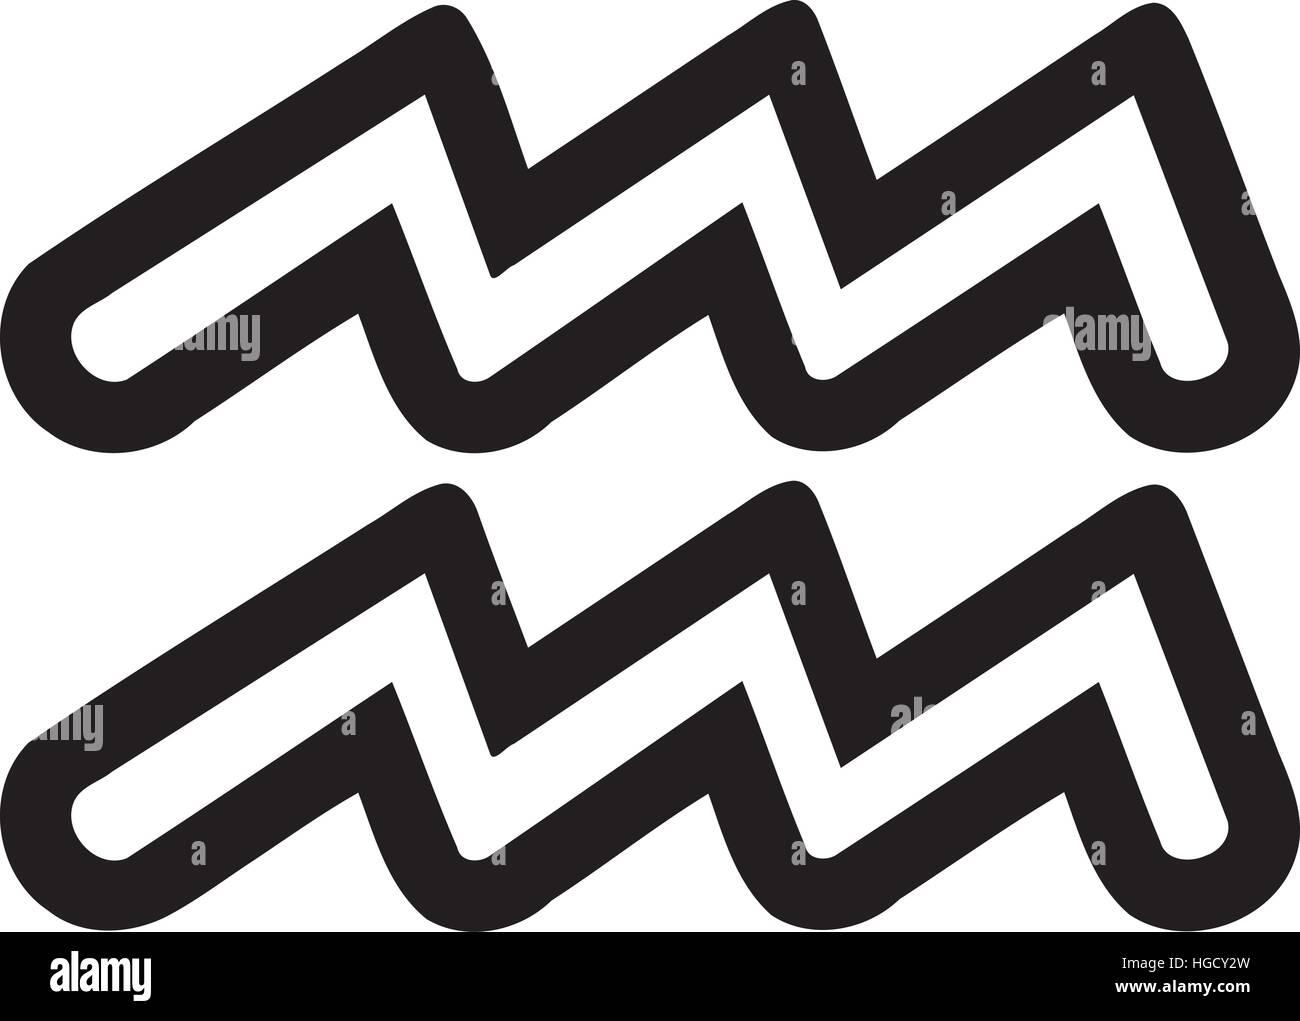 Zodiac Sign Aquarius Outline Stock Vector Art Illustration Vector